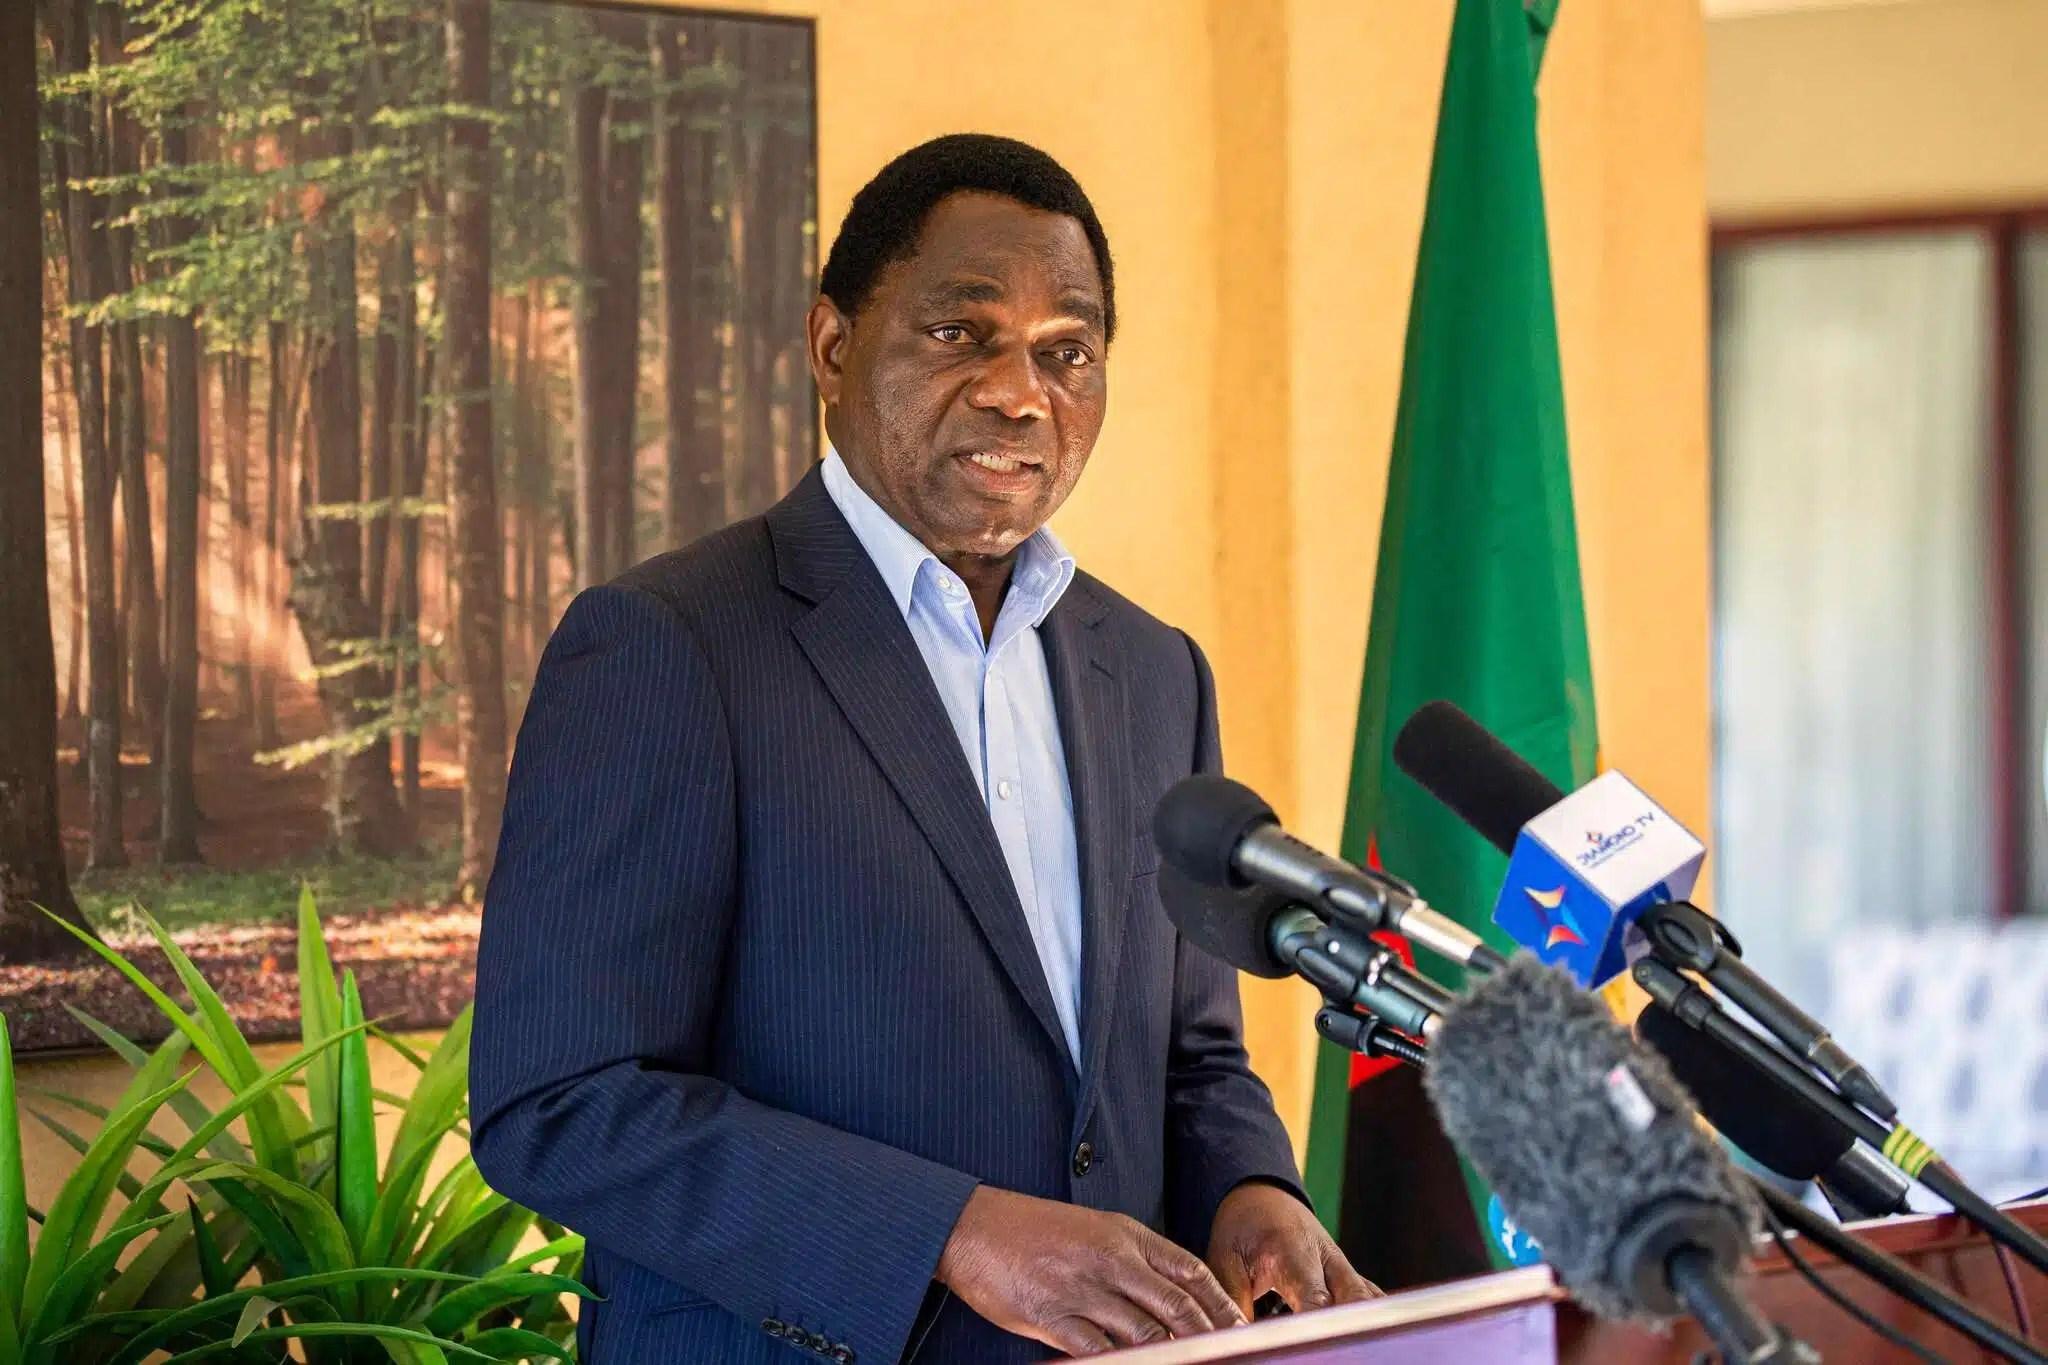 Hakainde Hichilema speaking at his home in Lusaka